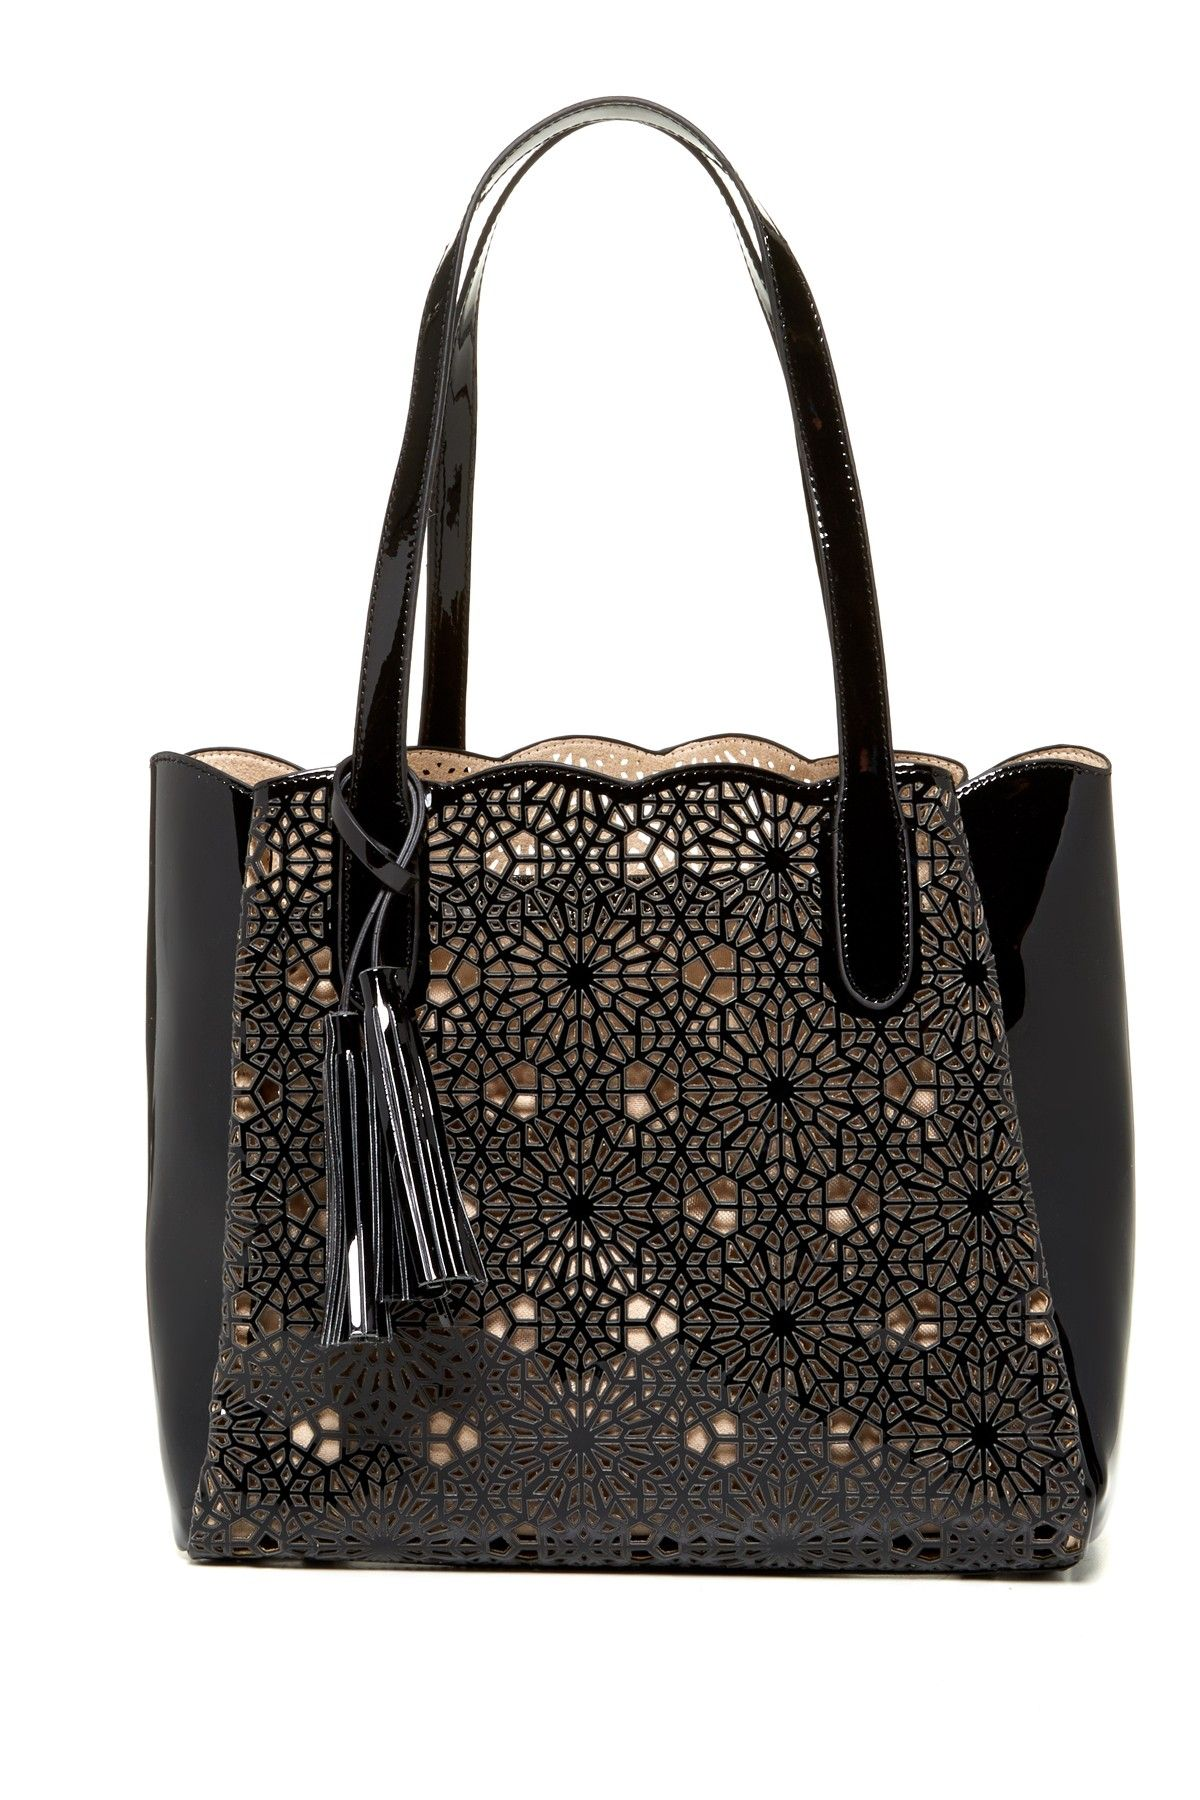 Buco Handbags Large Starburst Tote By On Hautelook